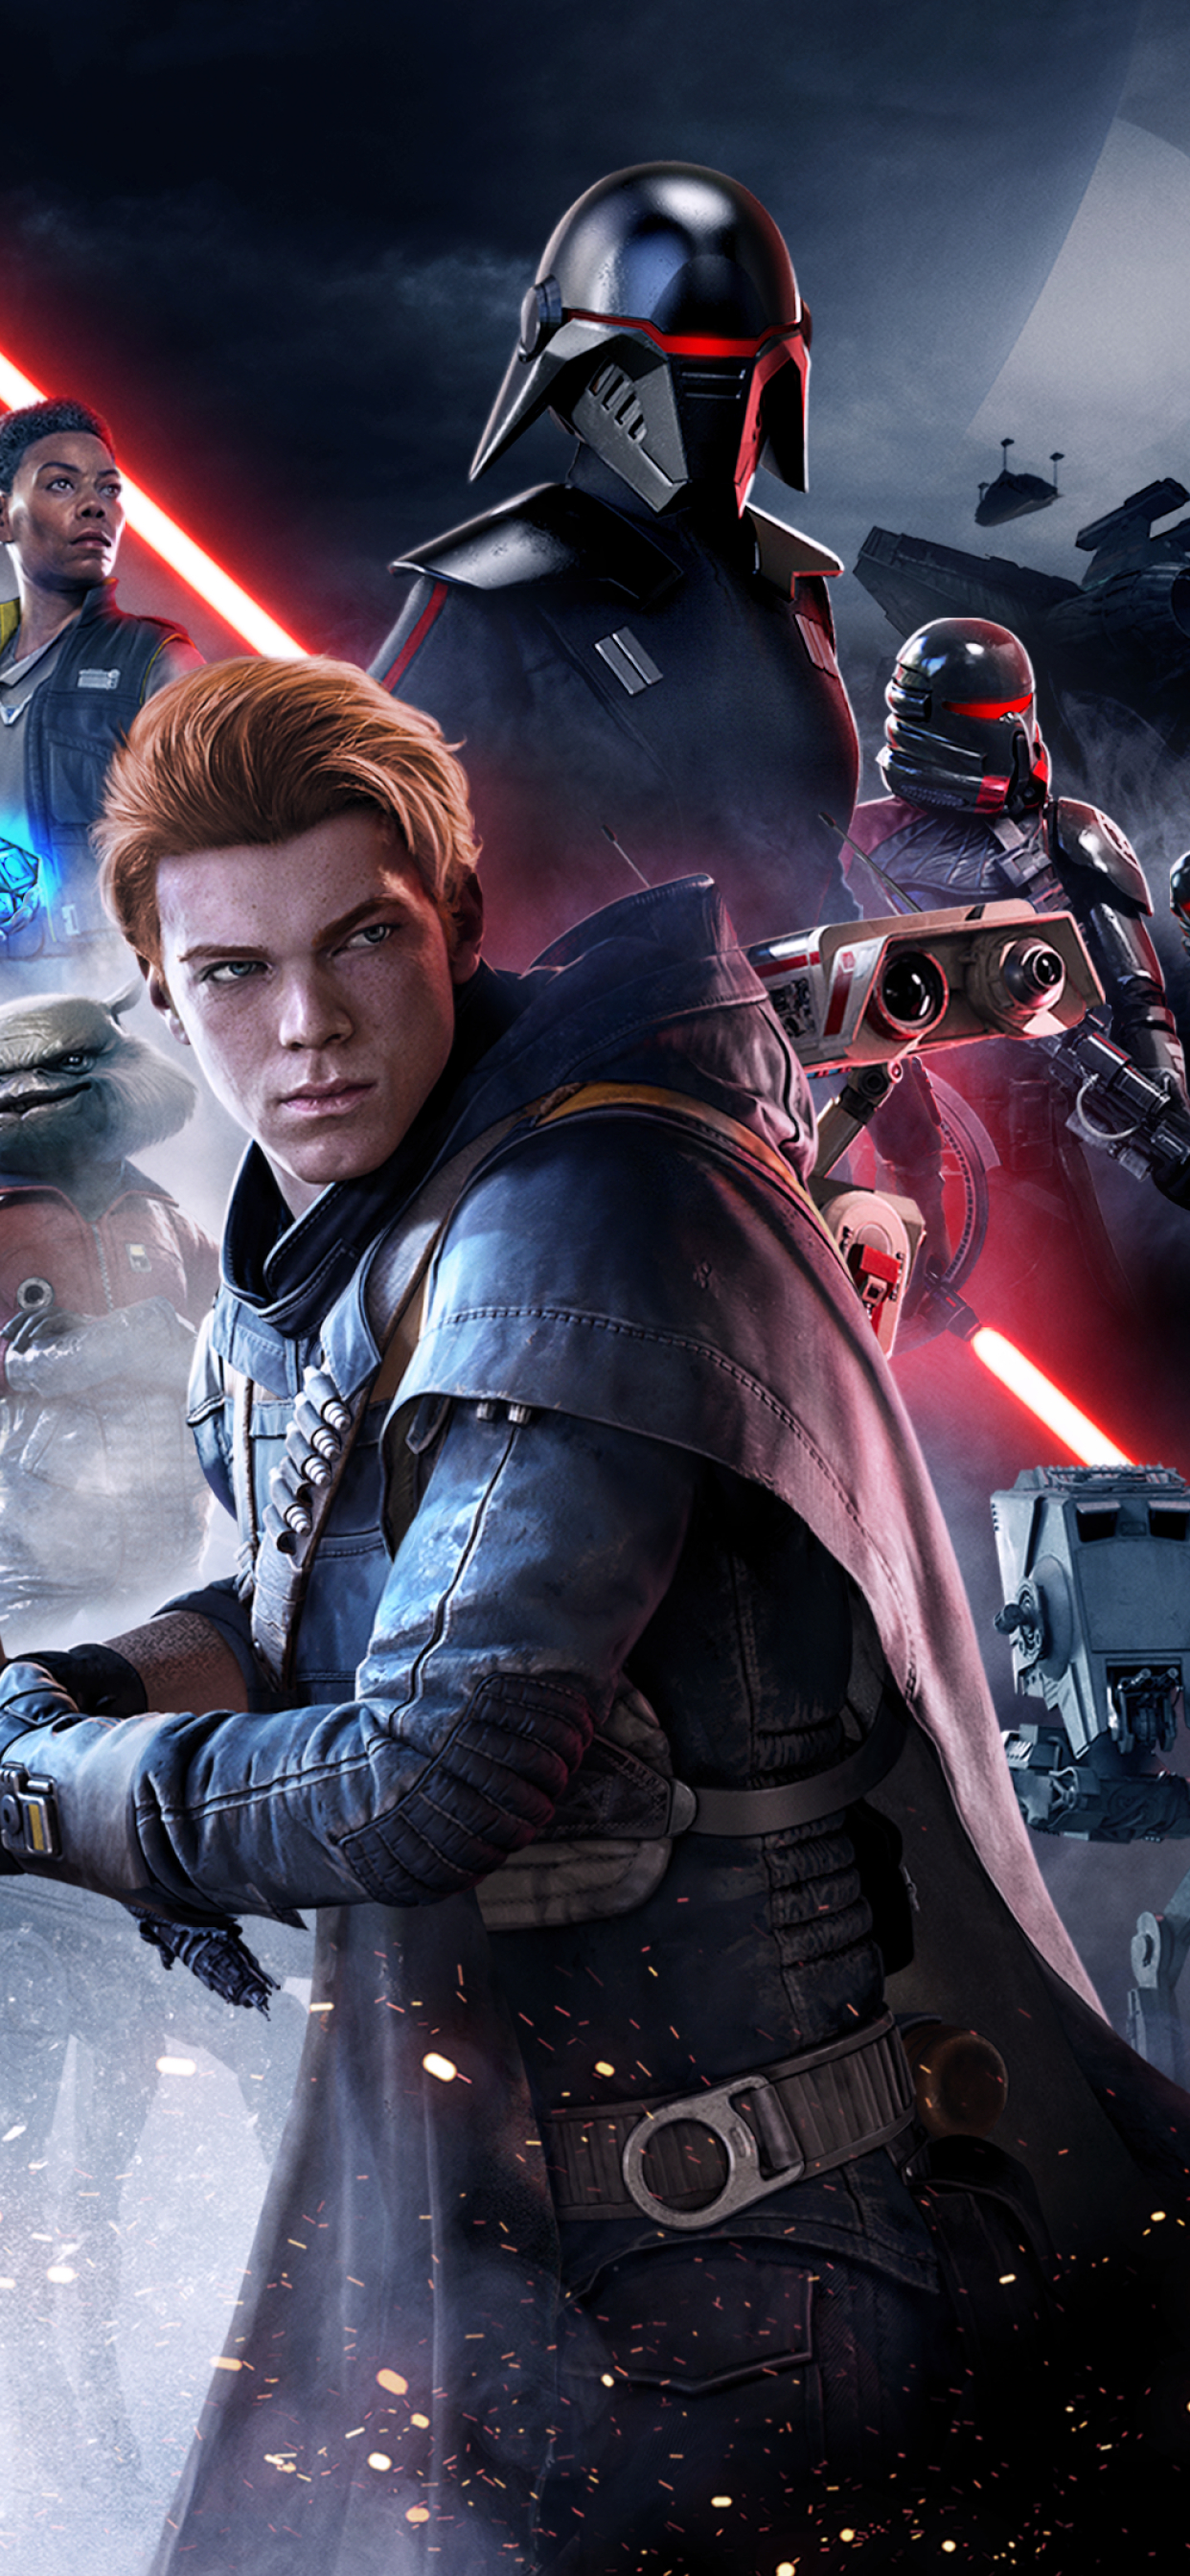 1242x2688 Star Wars Jedi Fallen Order Poster 2019 Iphone ...